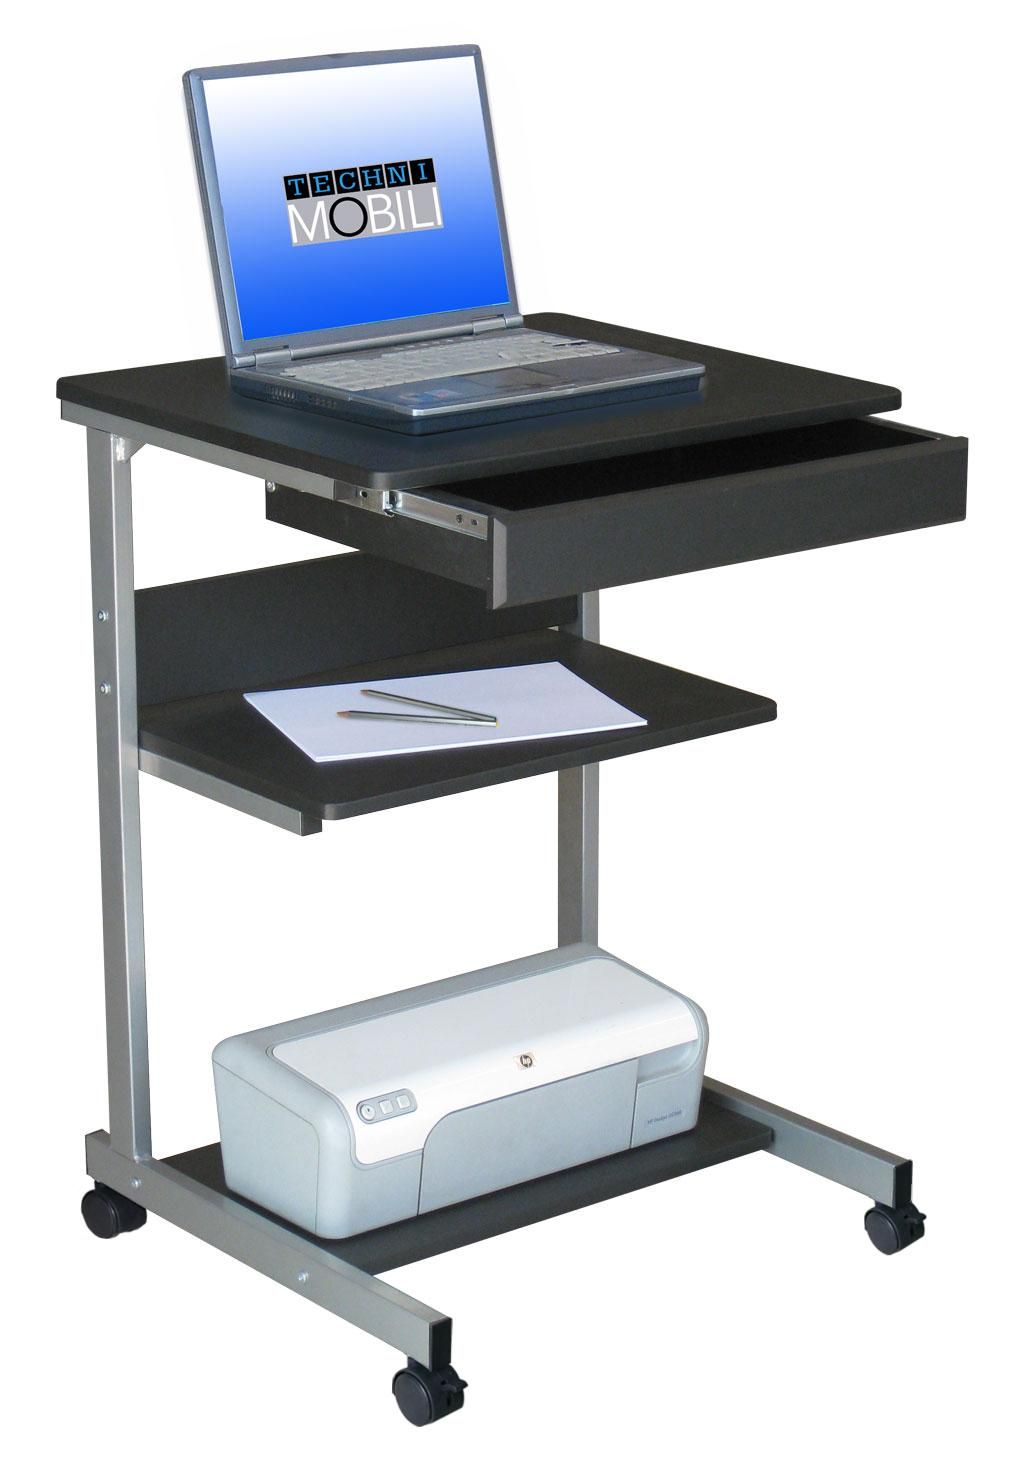 Techni Mobili Laptop Stand By Oj Commerce Rta B018 Gph06